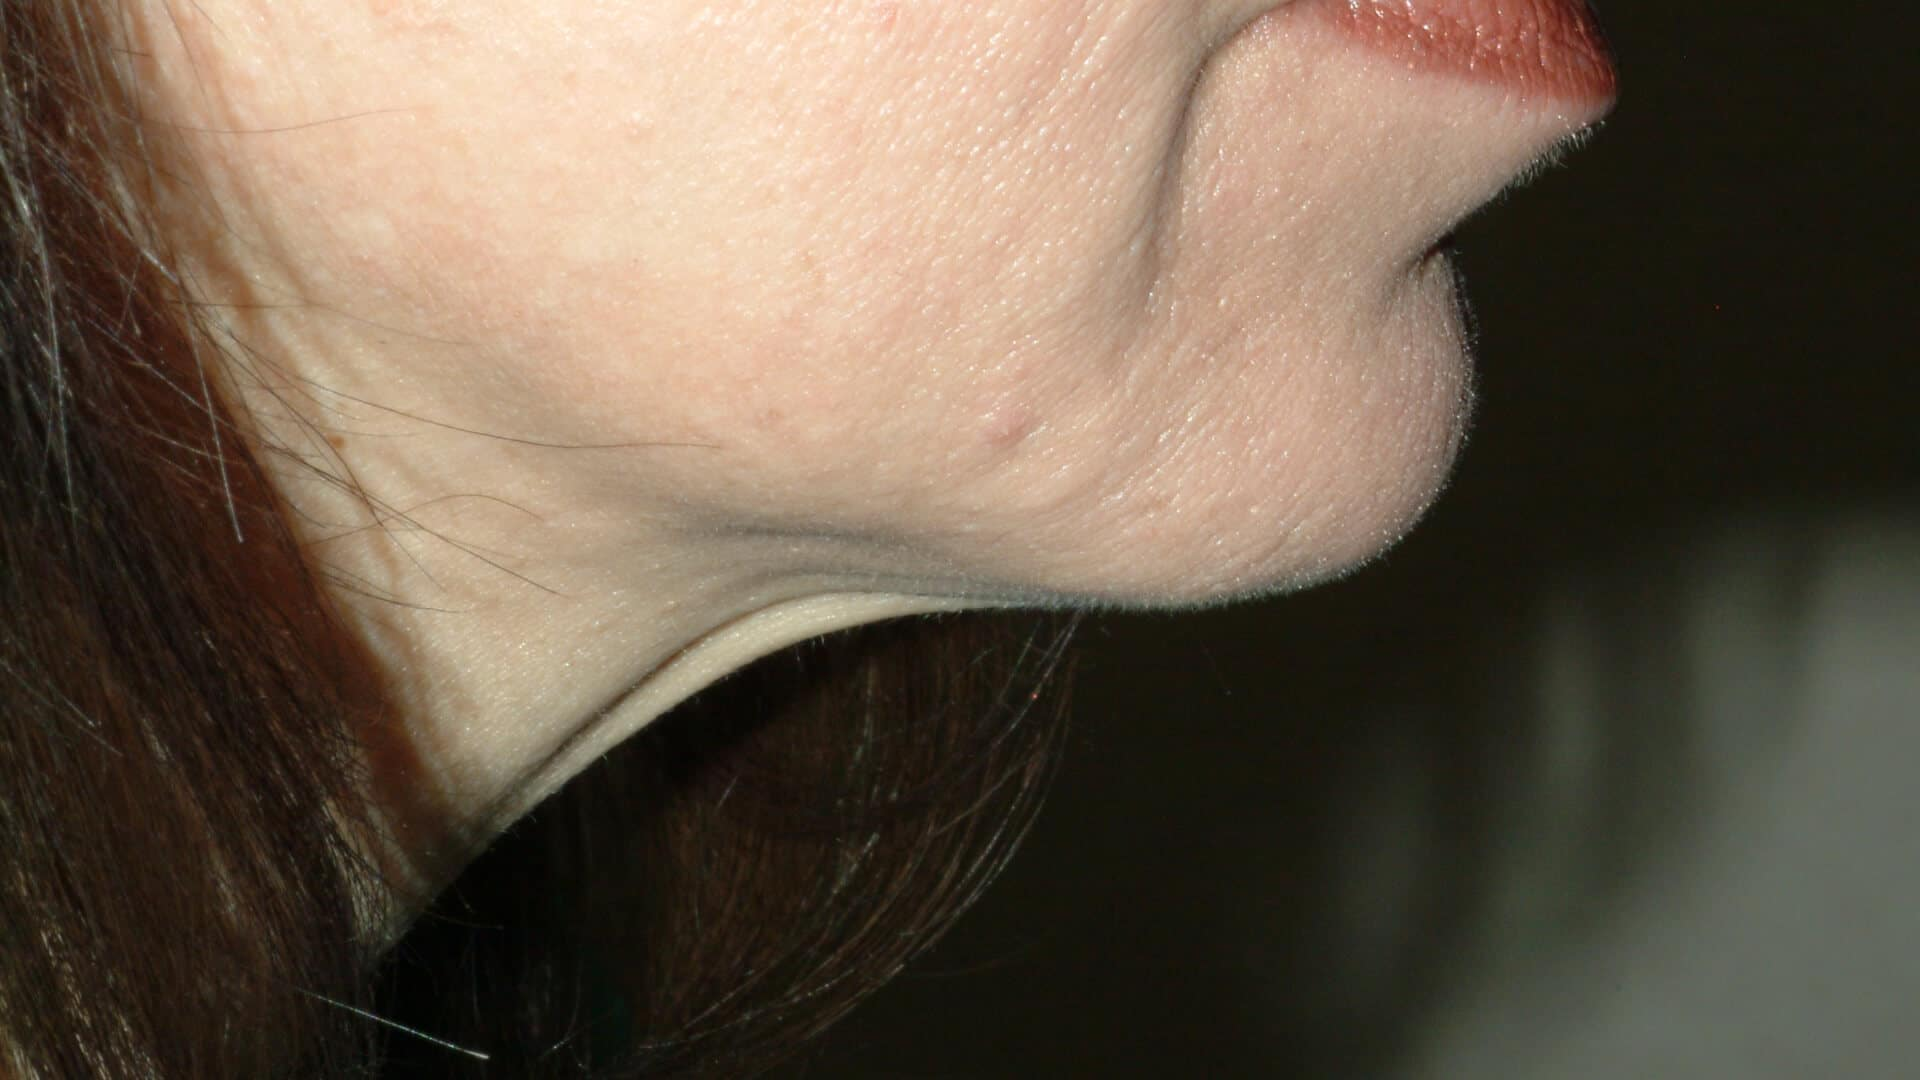 NECK LASER Liposuction – CASE #35713